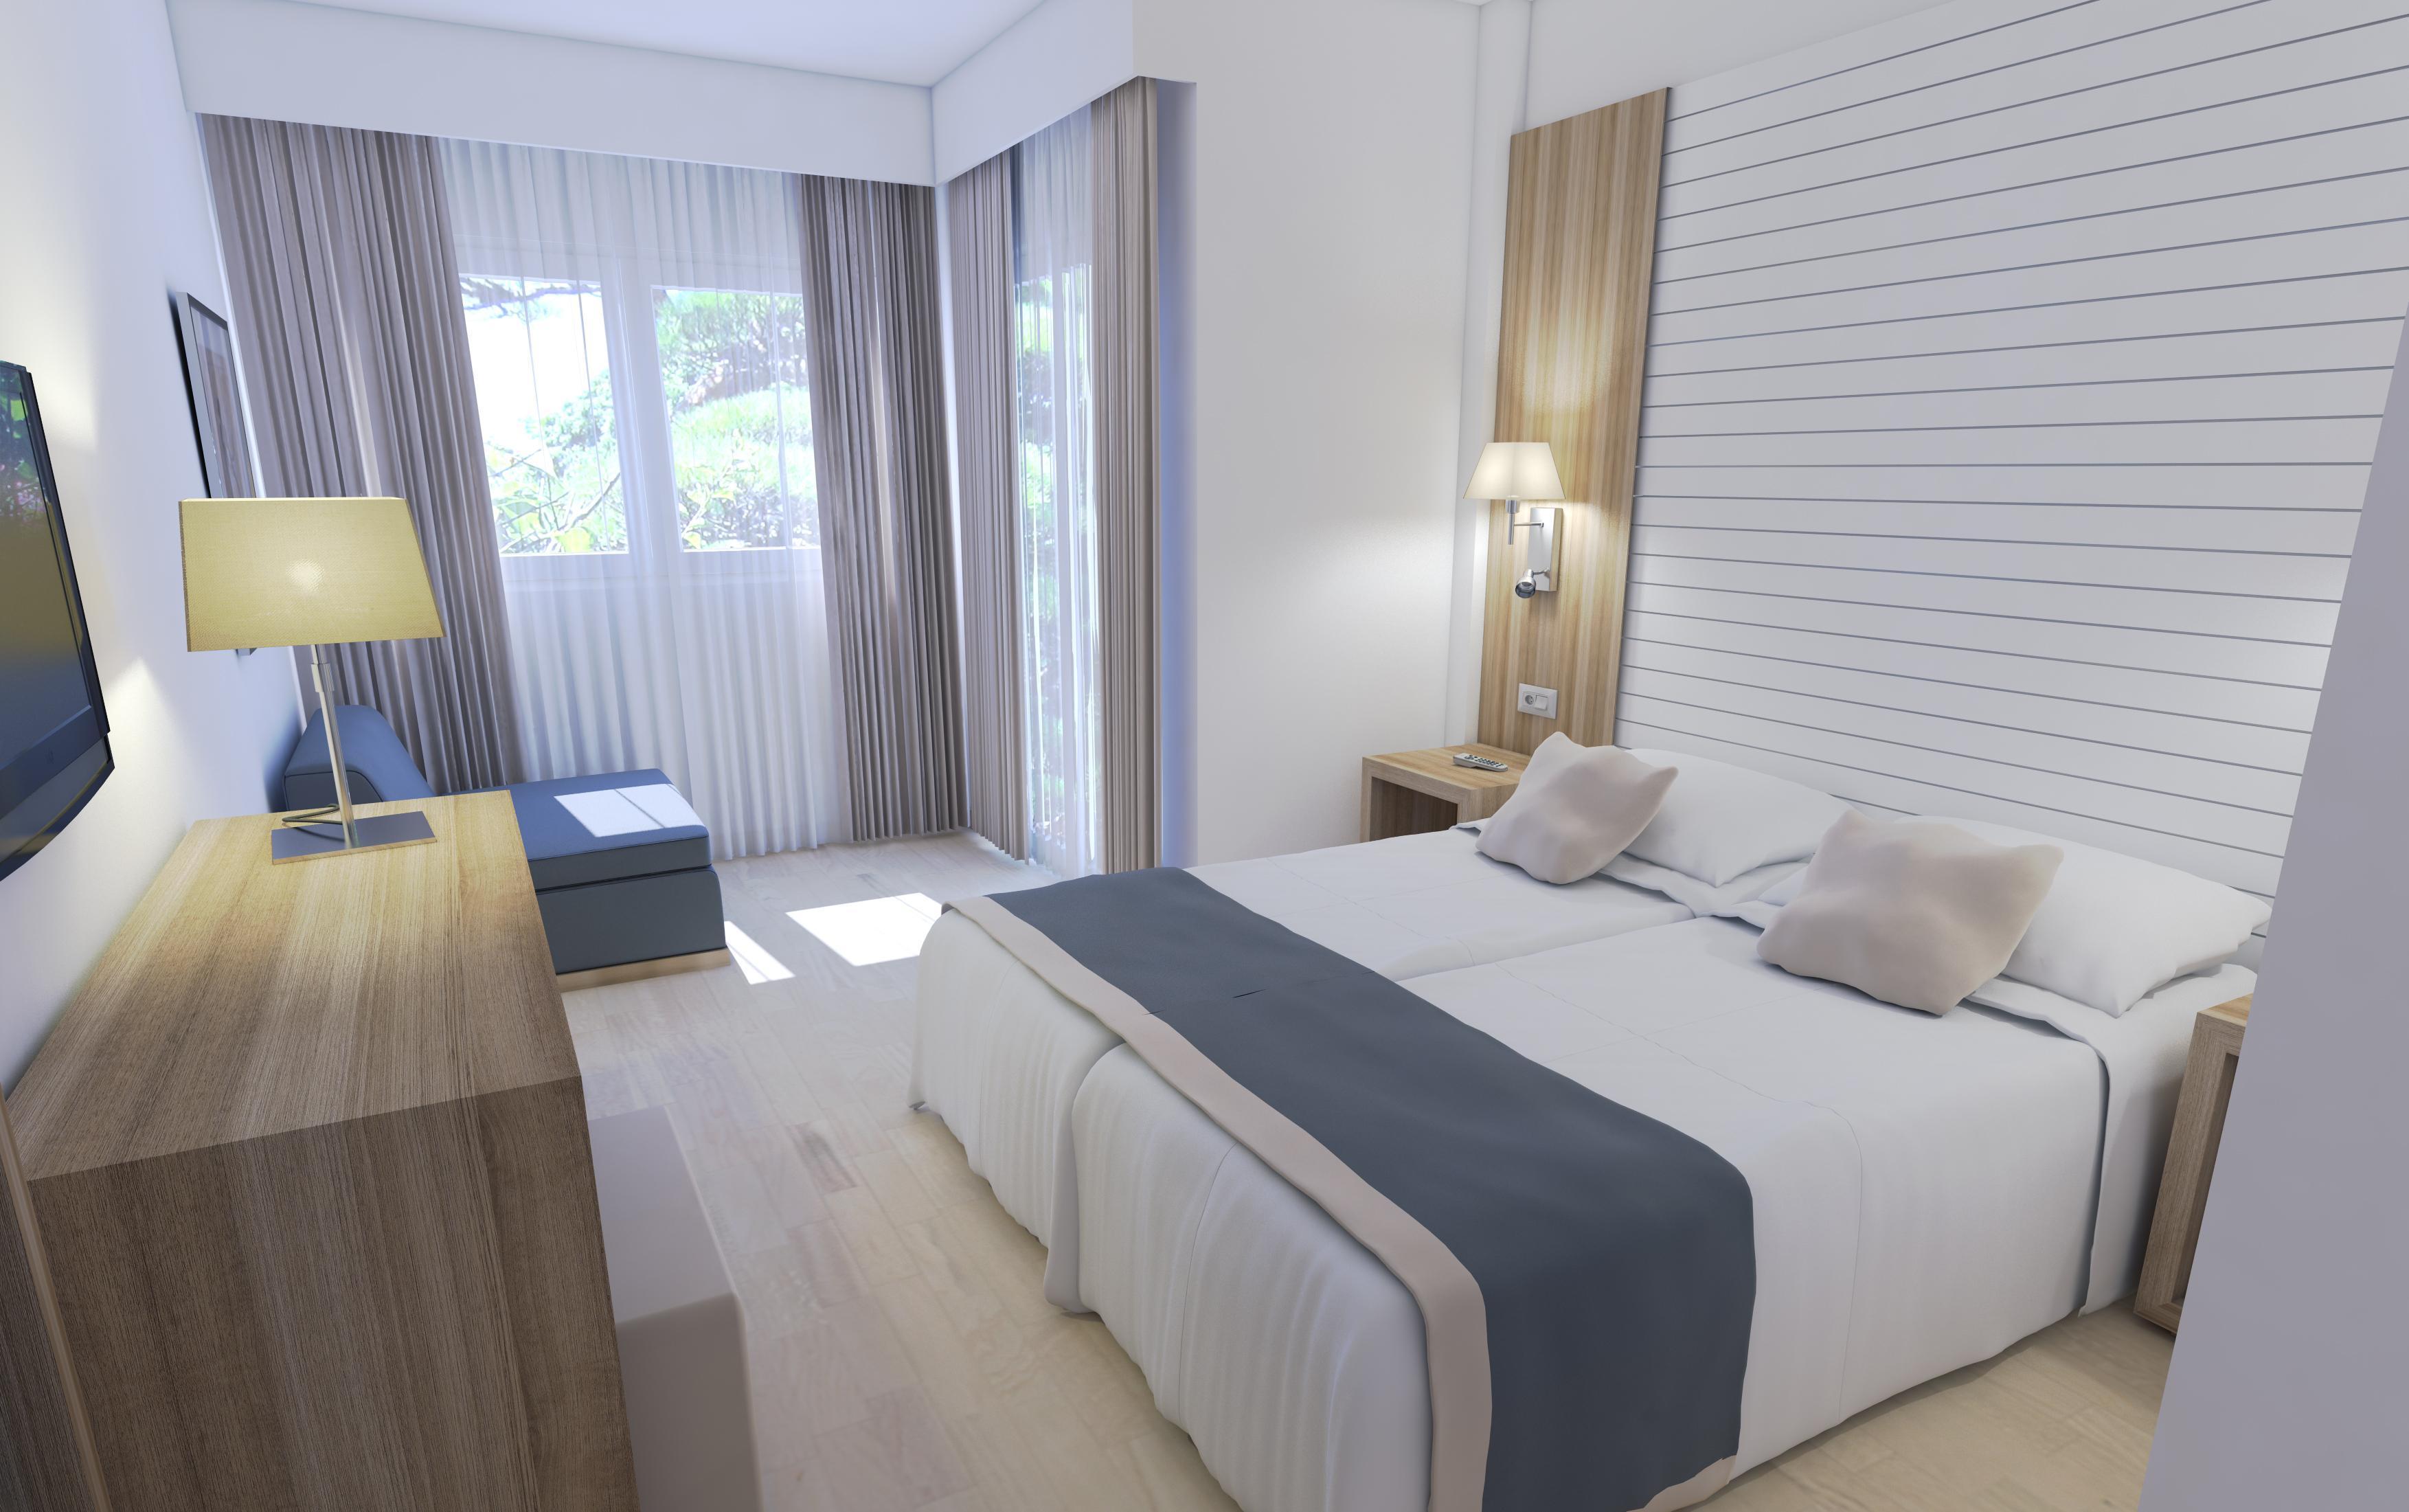 Hotel Paguera Mallorca - Morlans